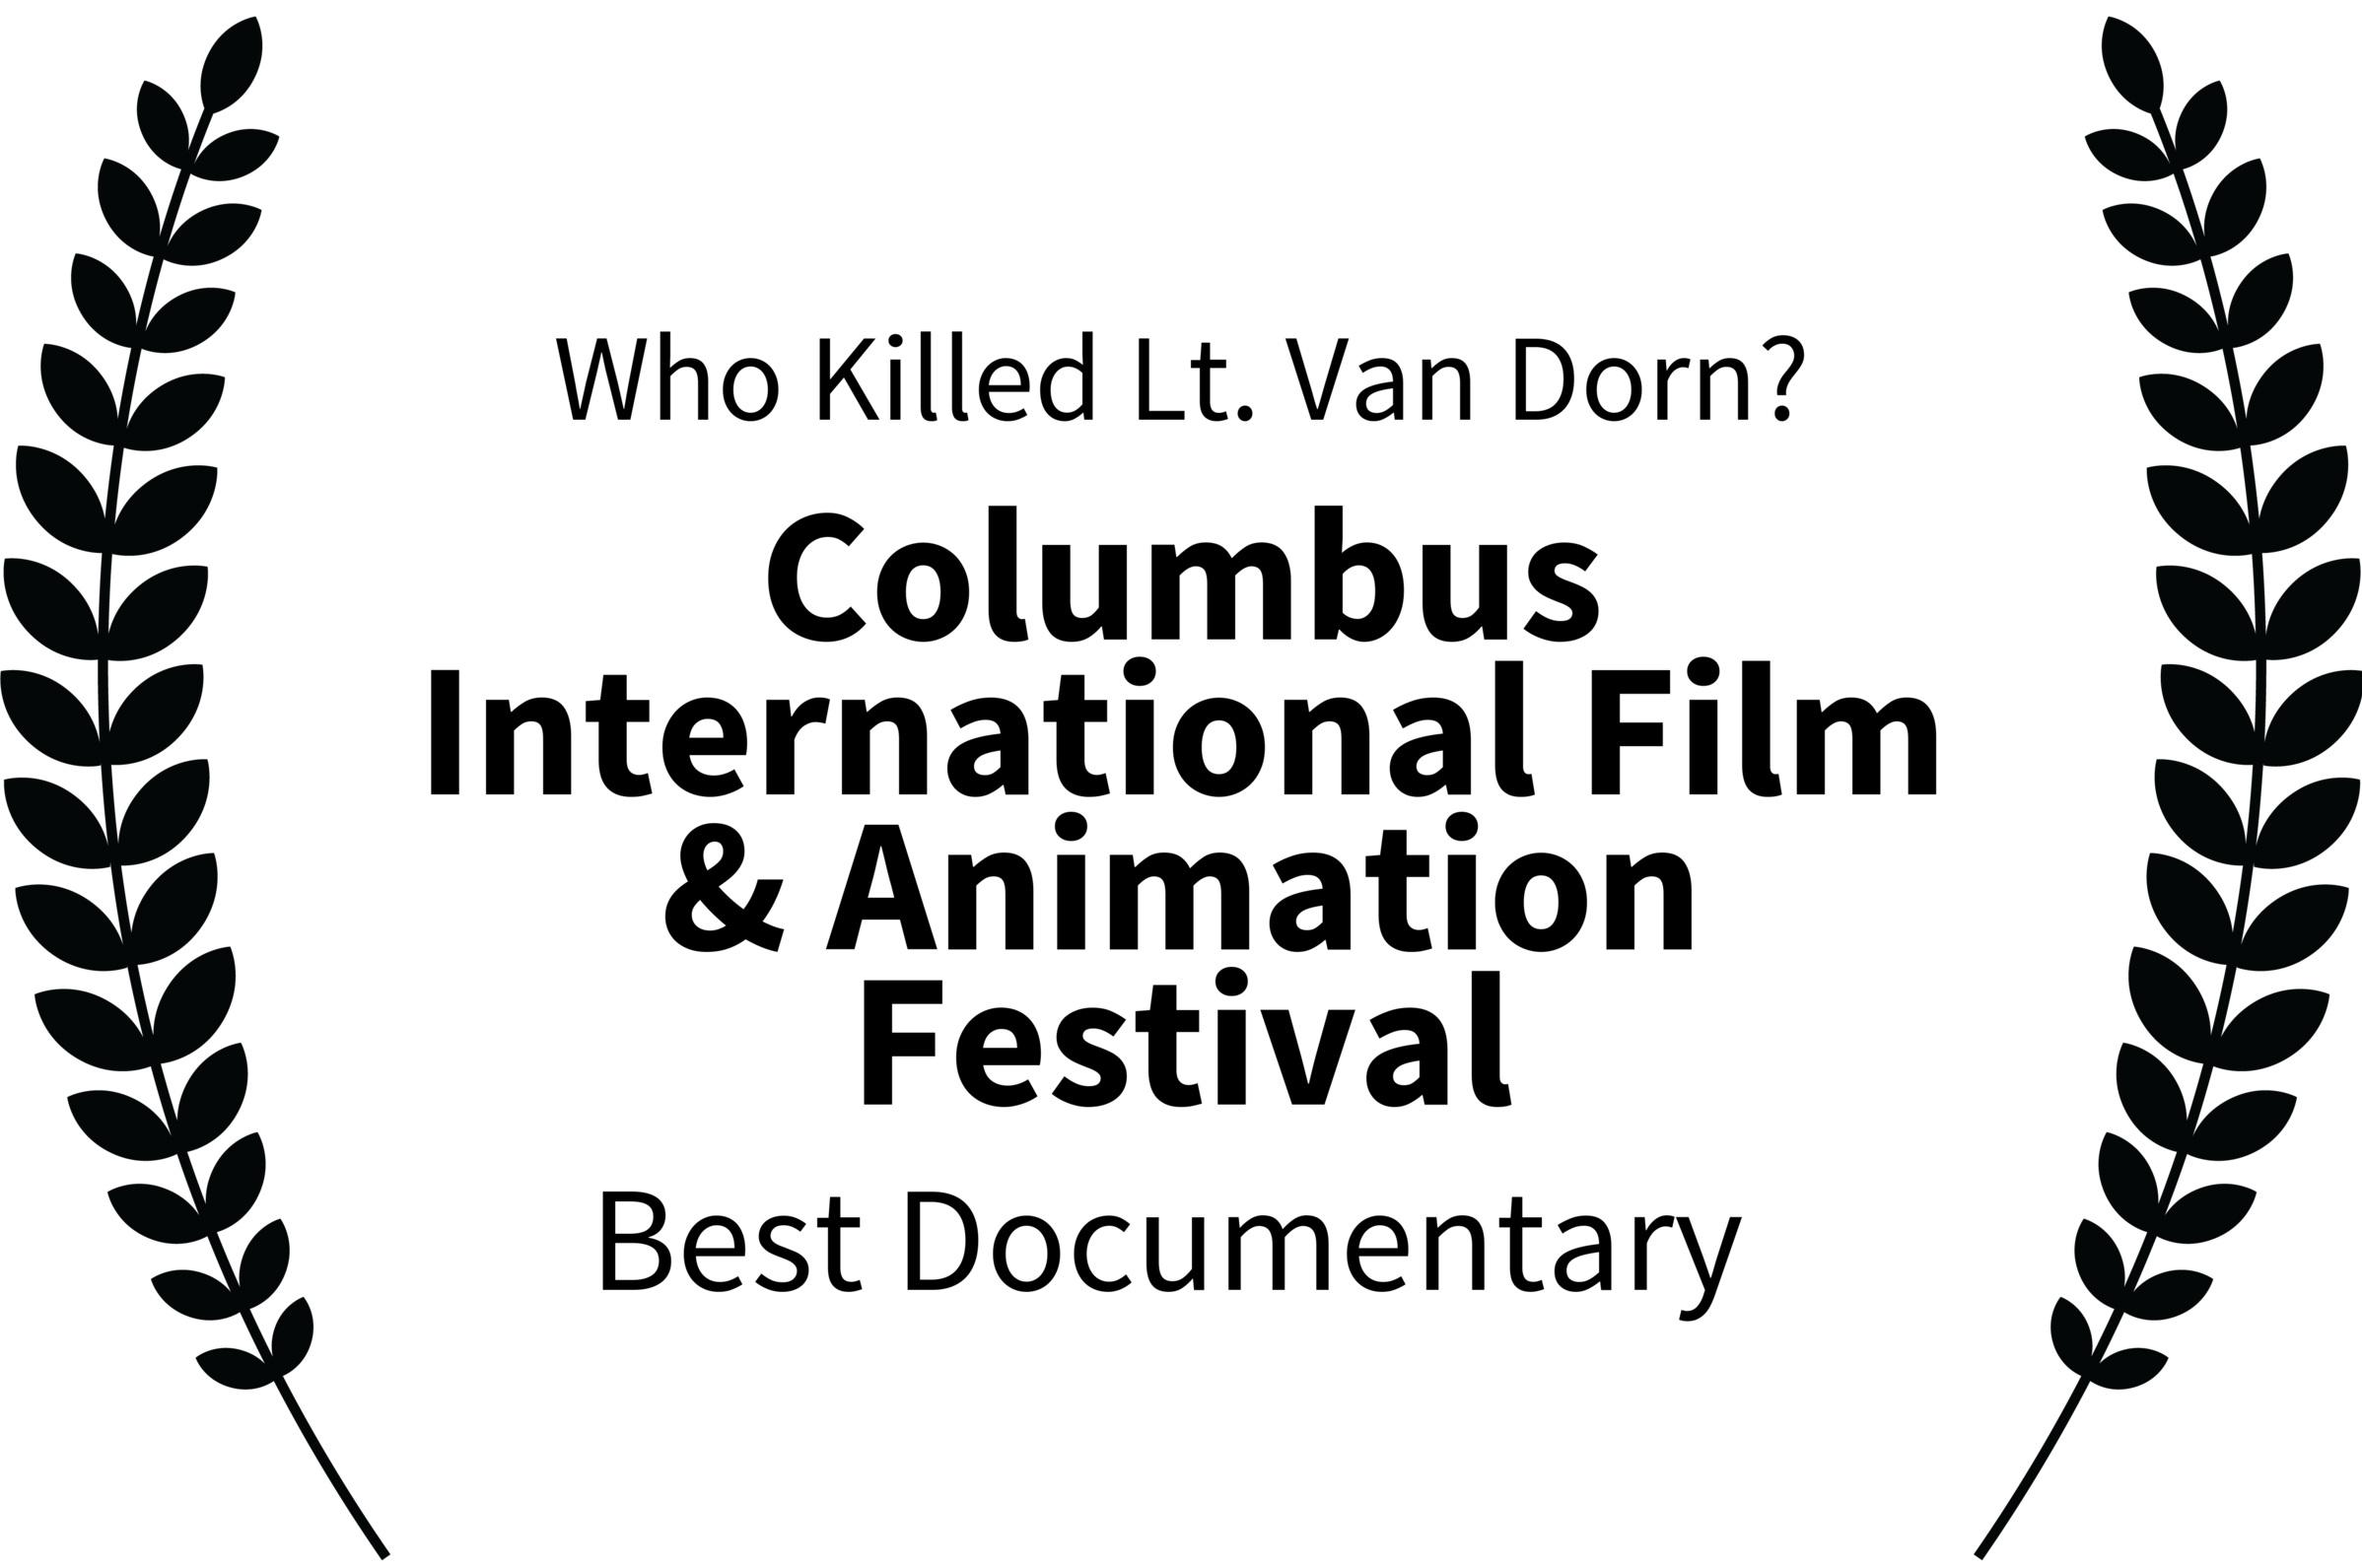 WhoKilledLt.VanDorn-ColumbusInternationalFilmAnimationFestival-BestDocumentary.png